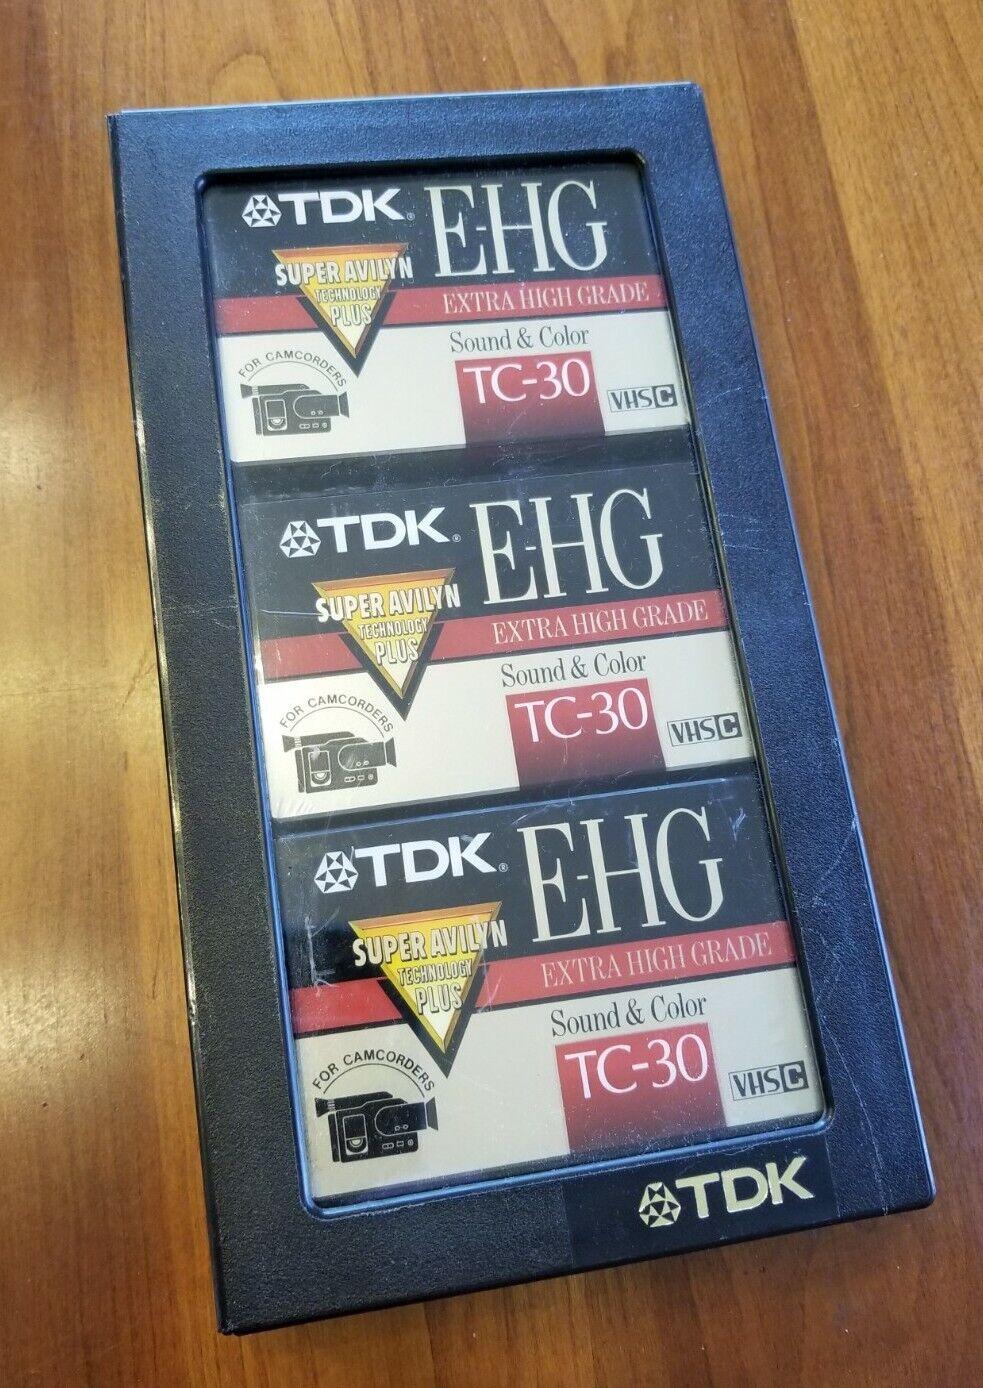 TDK TC-30 EHG VHS-C VIDEOCASSETTE NEW 3 pcs VIDEO TAPE VHSC EXTRA HIGH GRADE